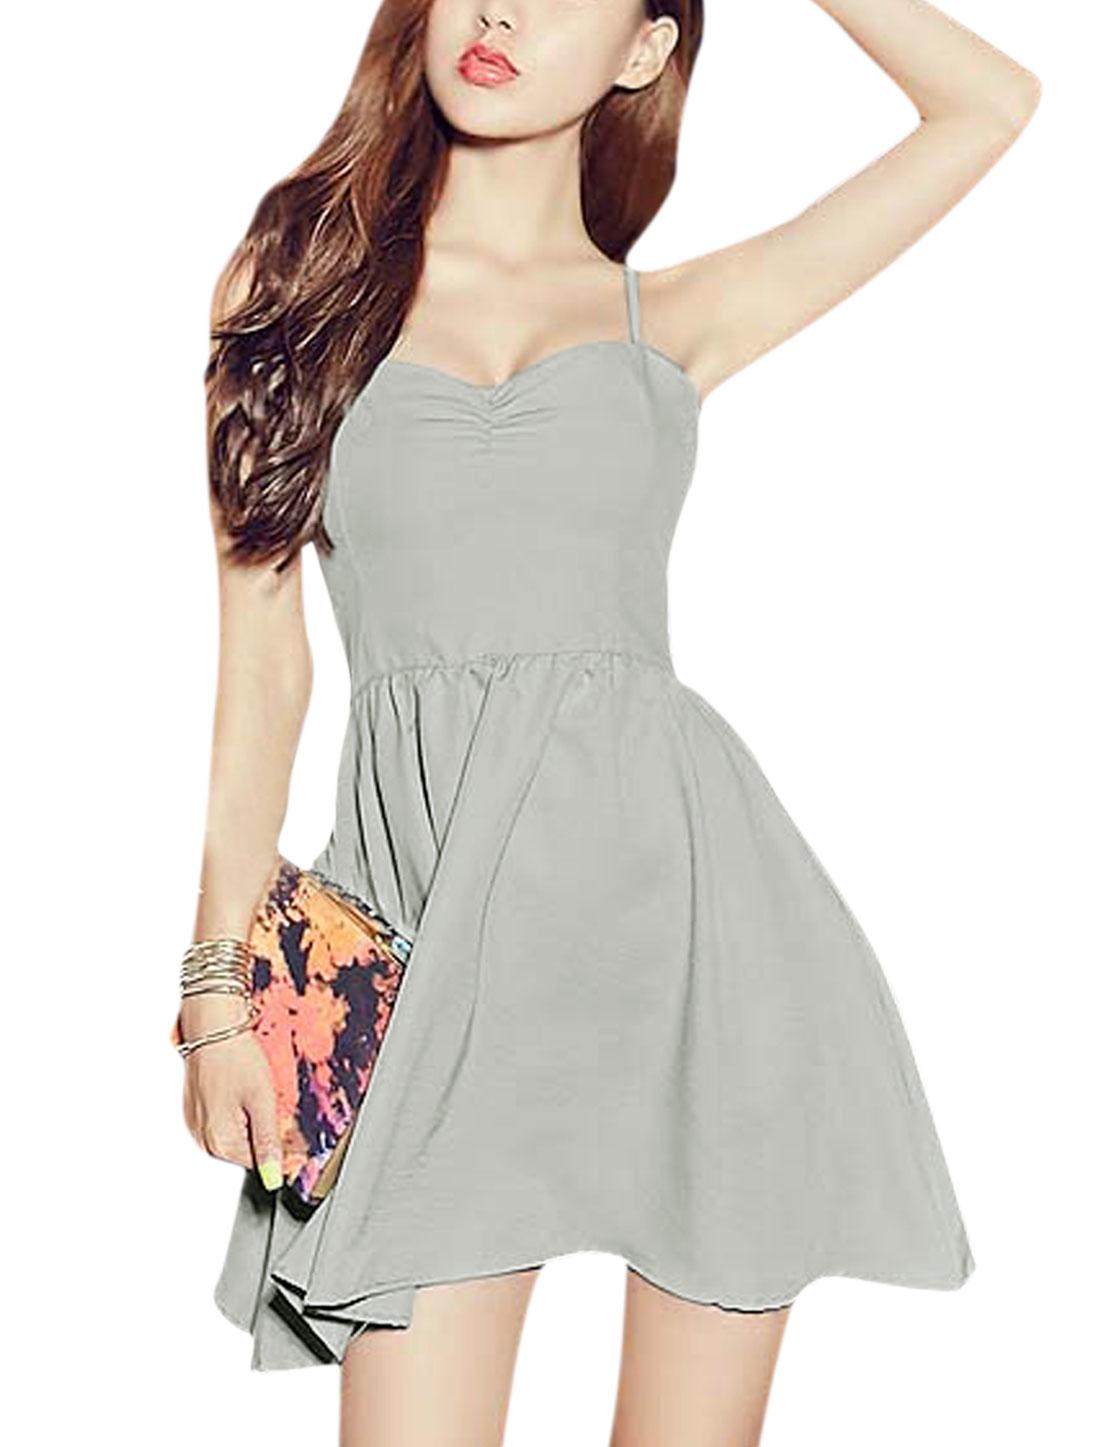 Women Sleeveless Sweetheart Neckline Lace Up Back Dress Light Gray XS